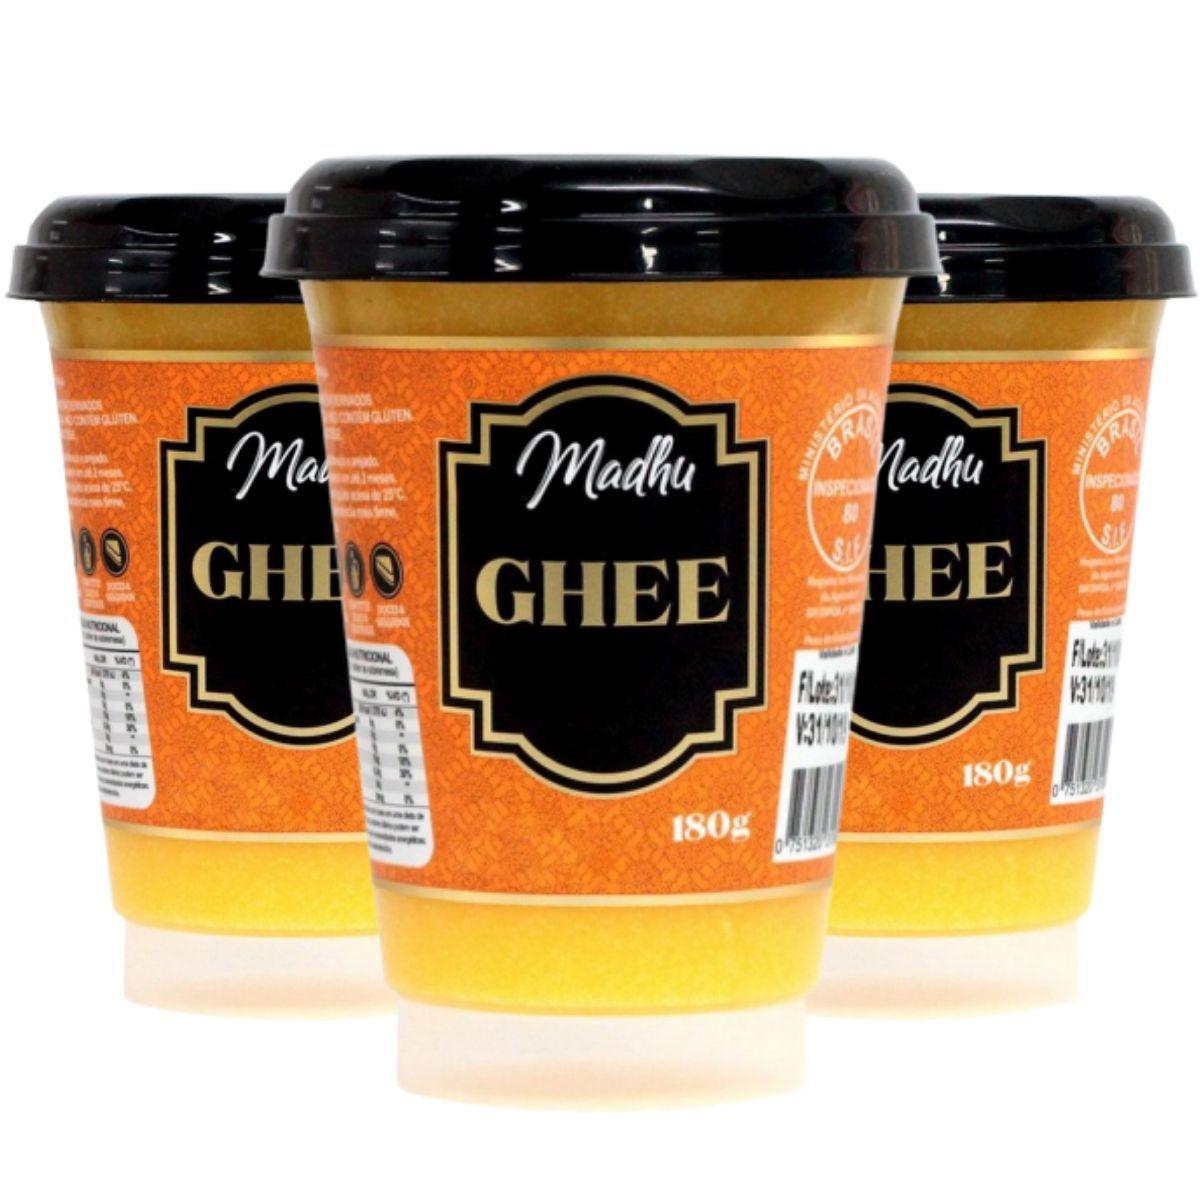 Kit 3 Manteigas Ghee Tradicional Clarificada 180g - Madhu Bakery